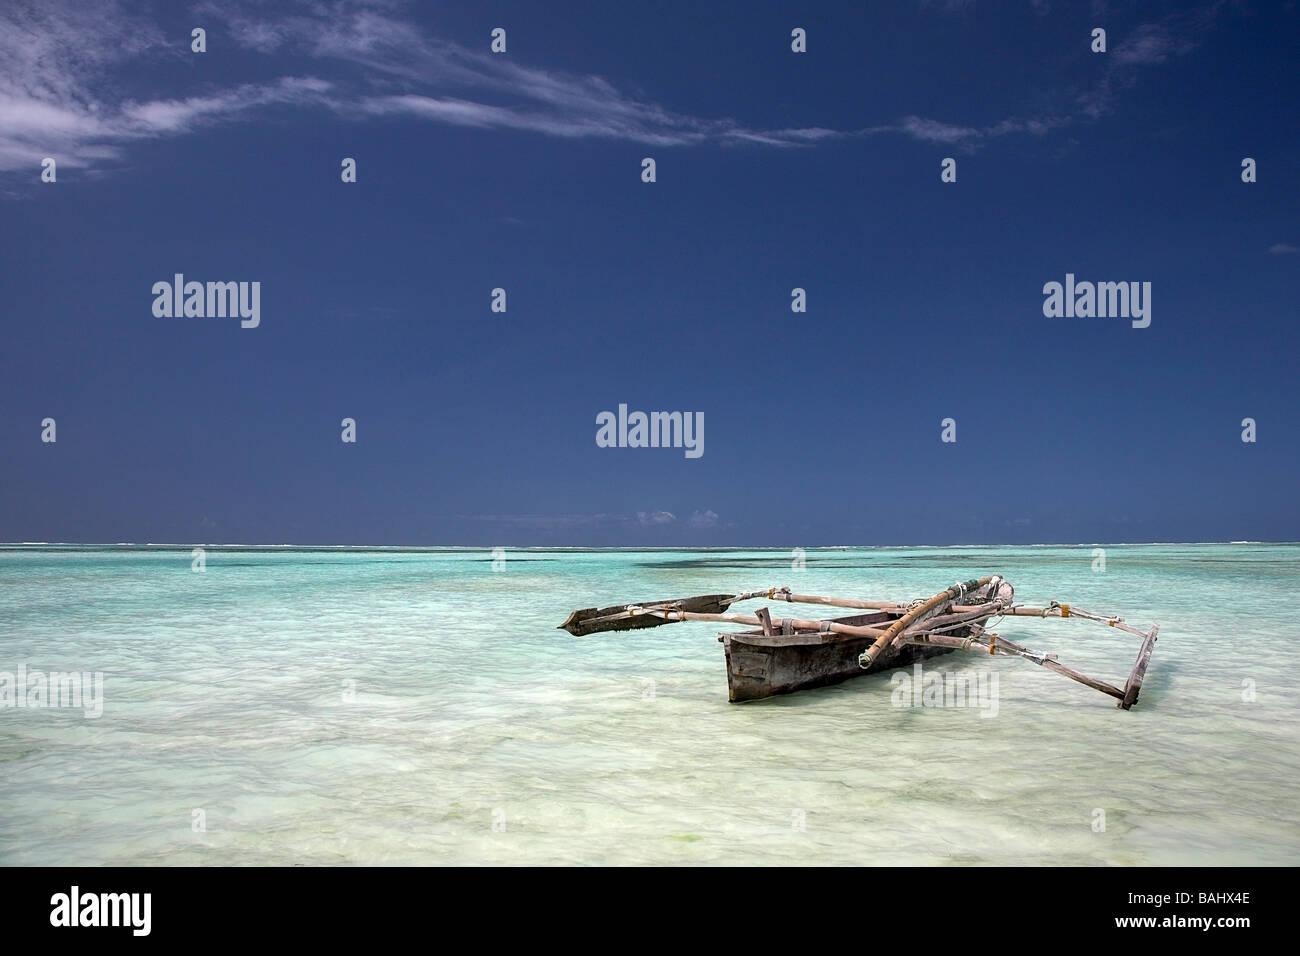 Zanzibar, Tanzania; Dhow in shallow water - Stock Image